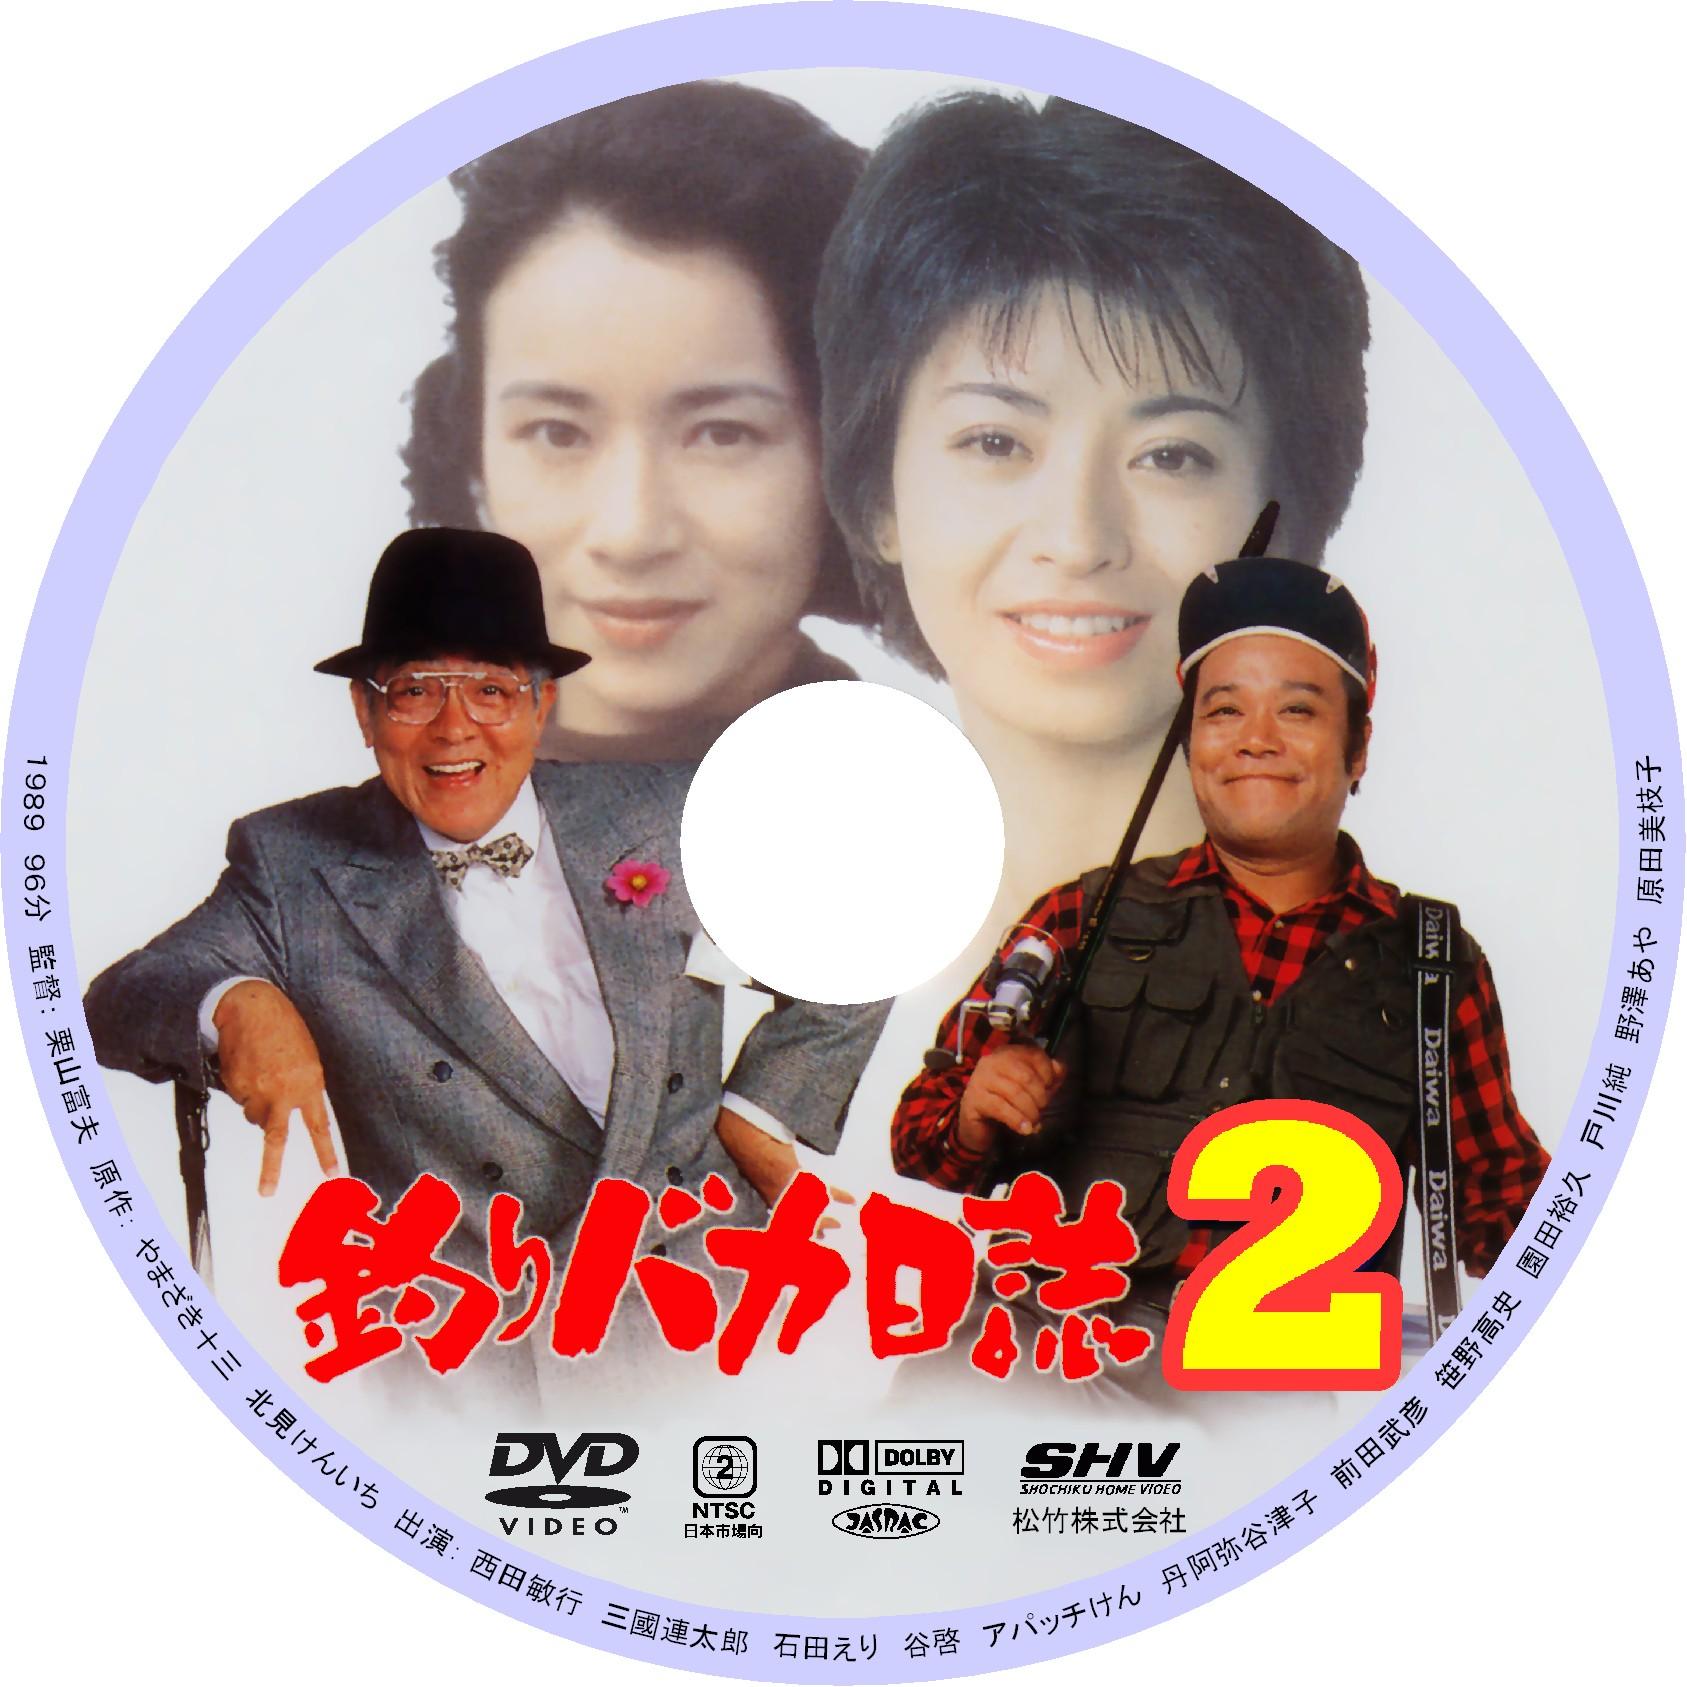 DVDデータベース : <b>釣りバカ日誌2</b> - livedoor Blog(ブログ)